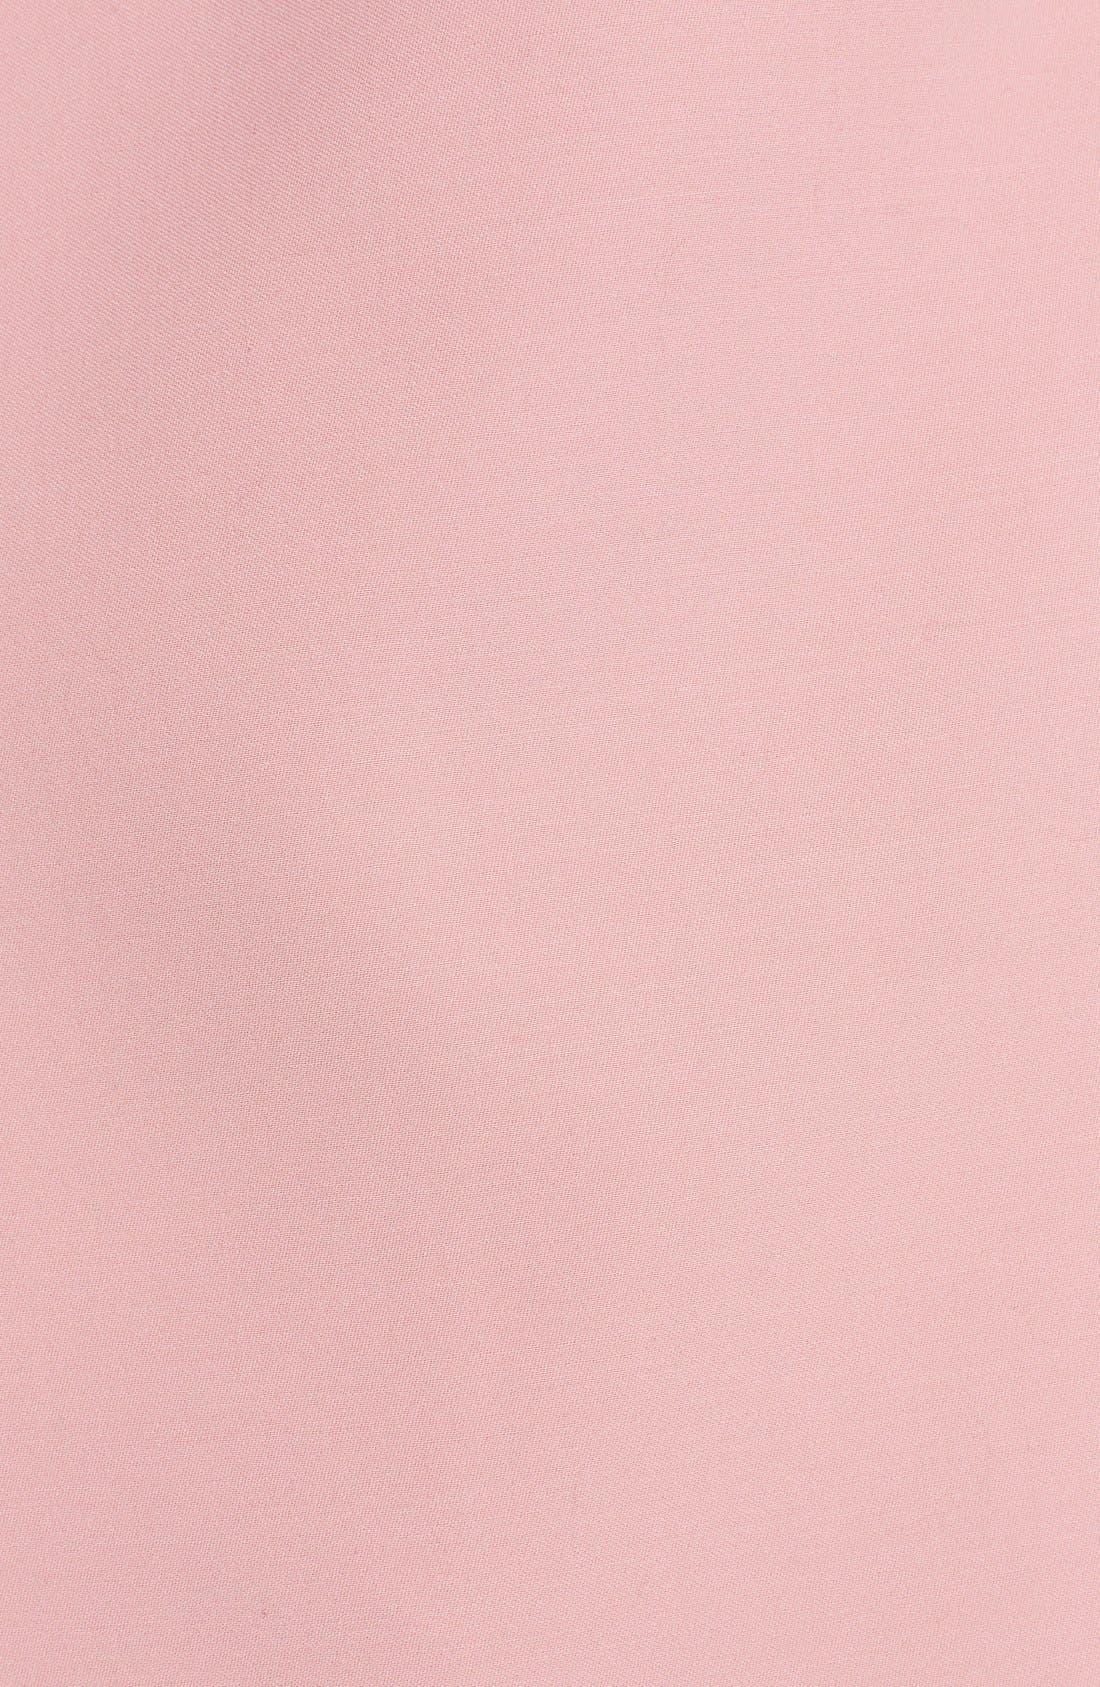 MARNI,                             Wide Lapel Wool Blend Coat,                             Alternate thumbnail 3, color,                             650